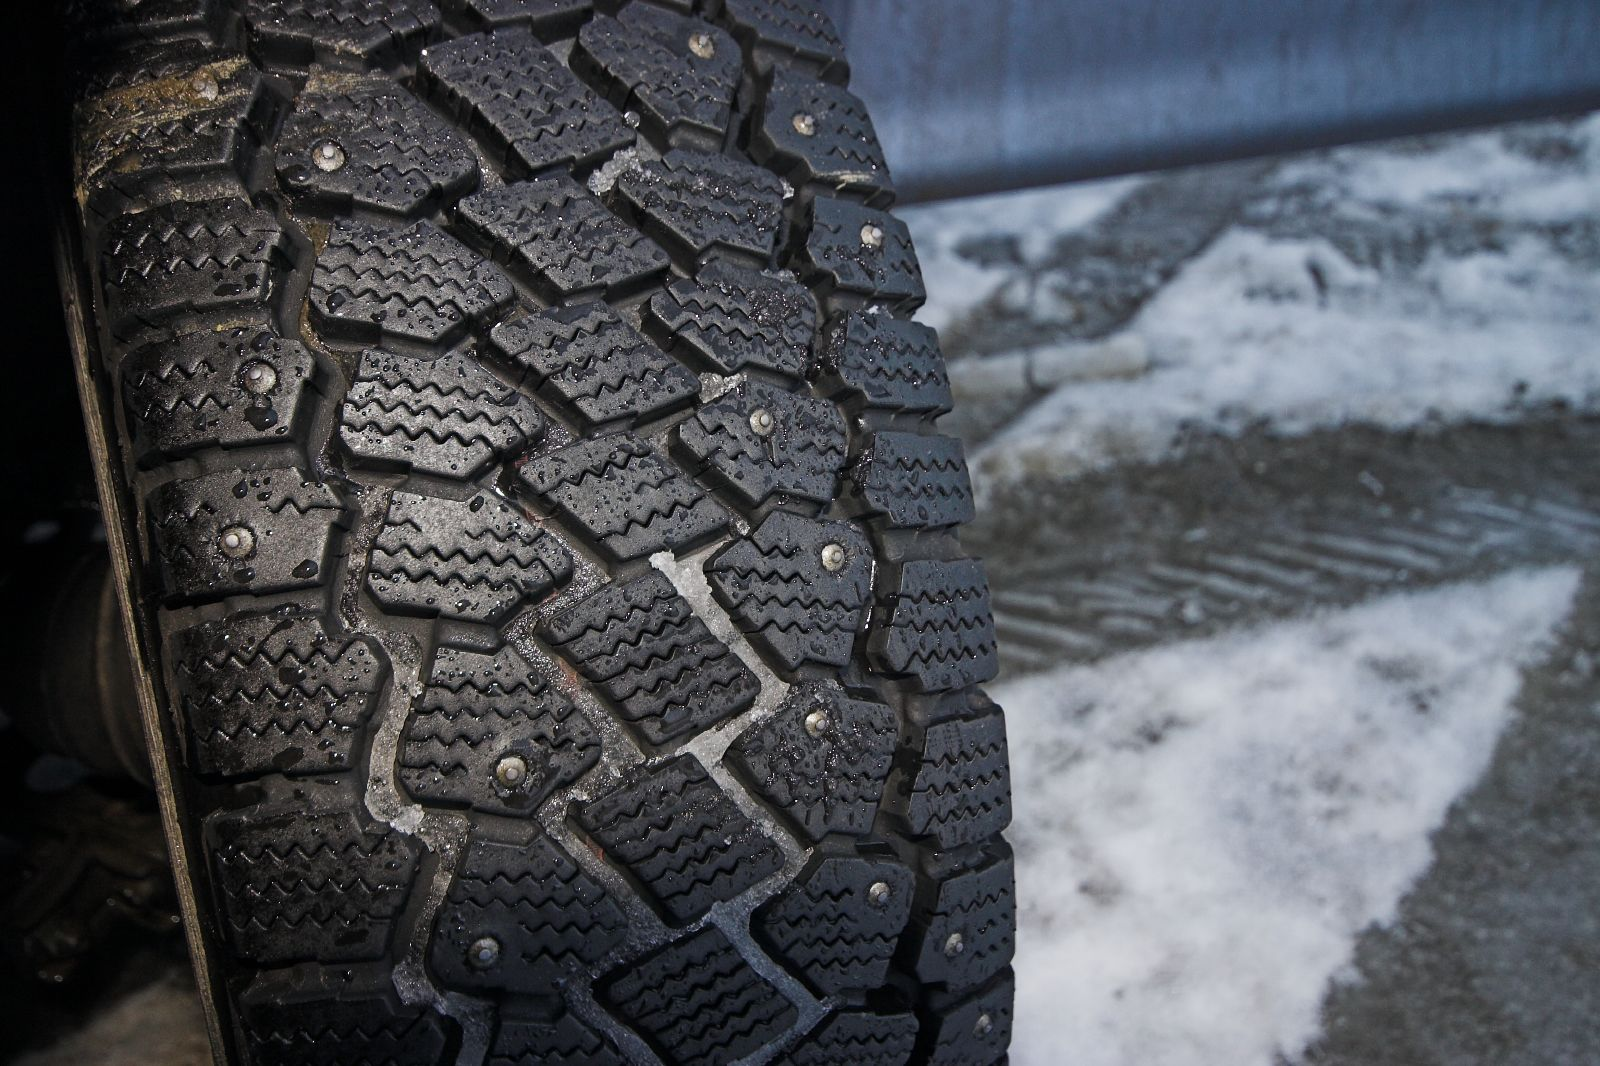 Studded Snow Tire, Image: Jon Bowen